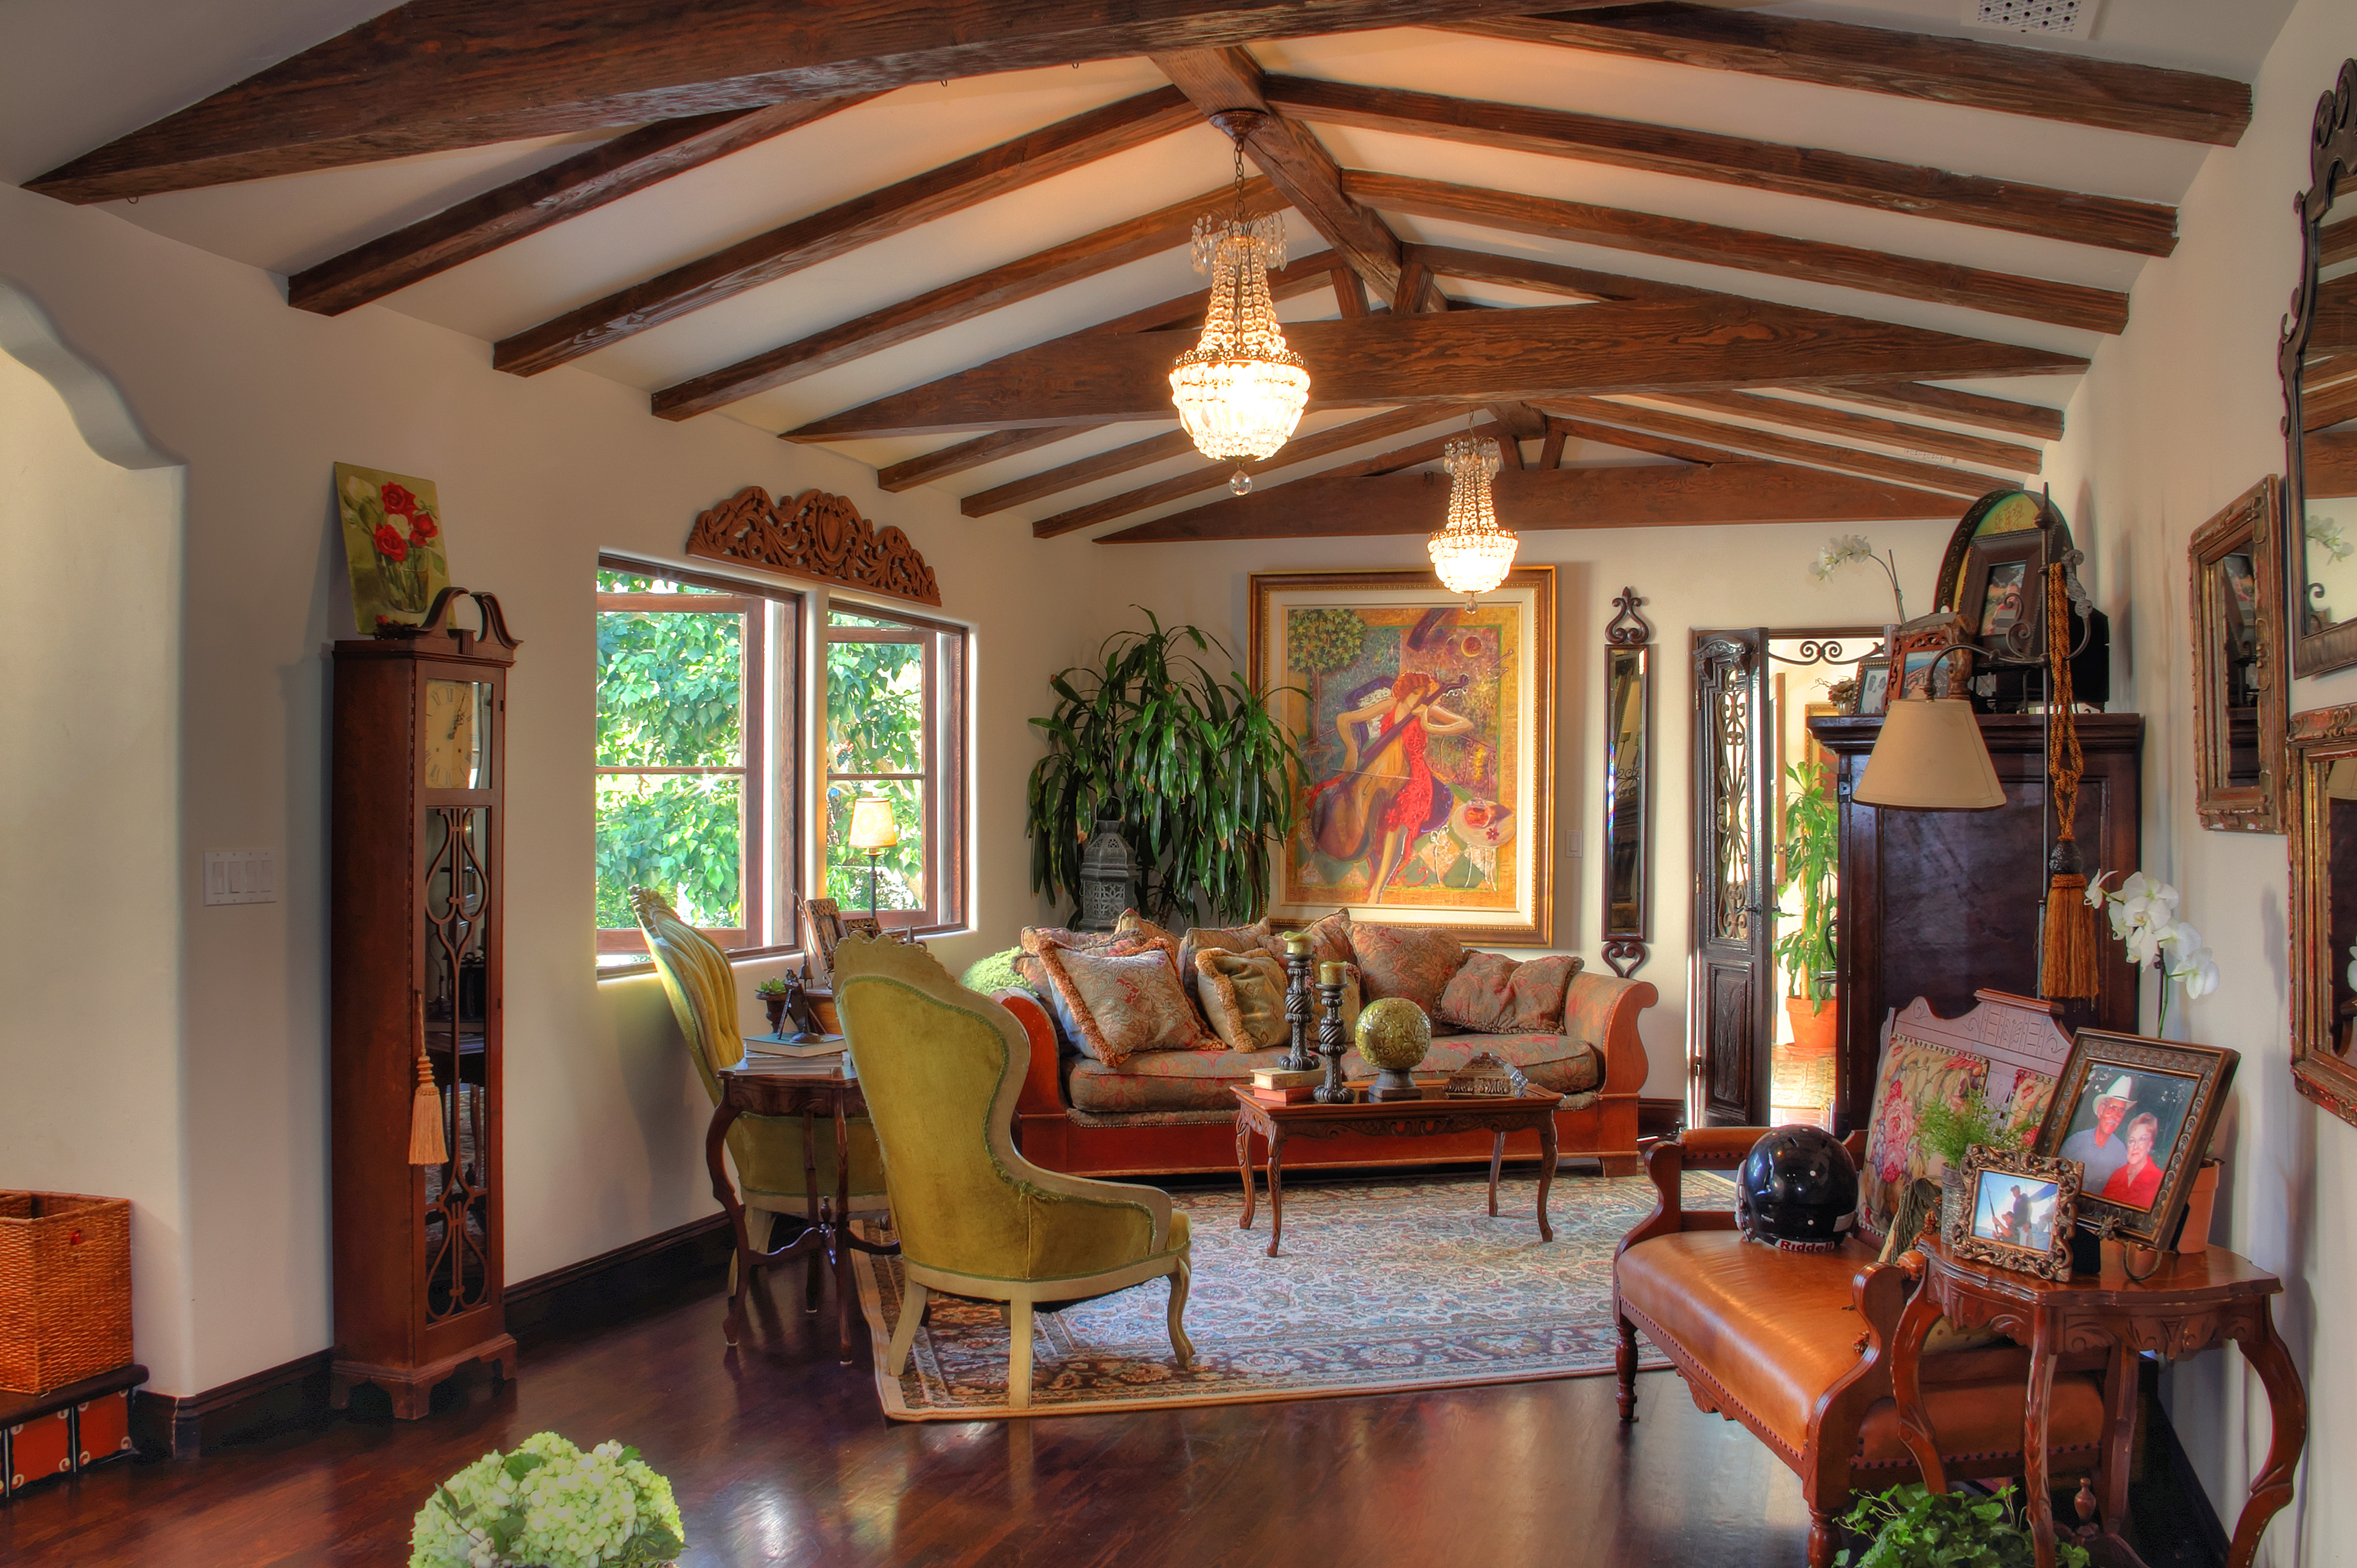 Living Room Spanish Style Design - HomesFeed